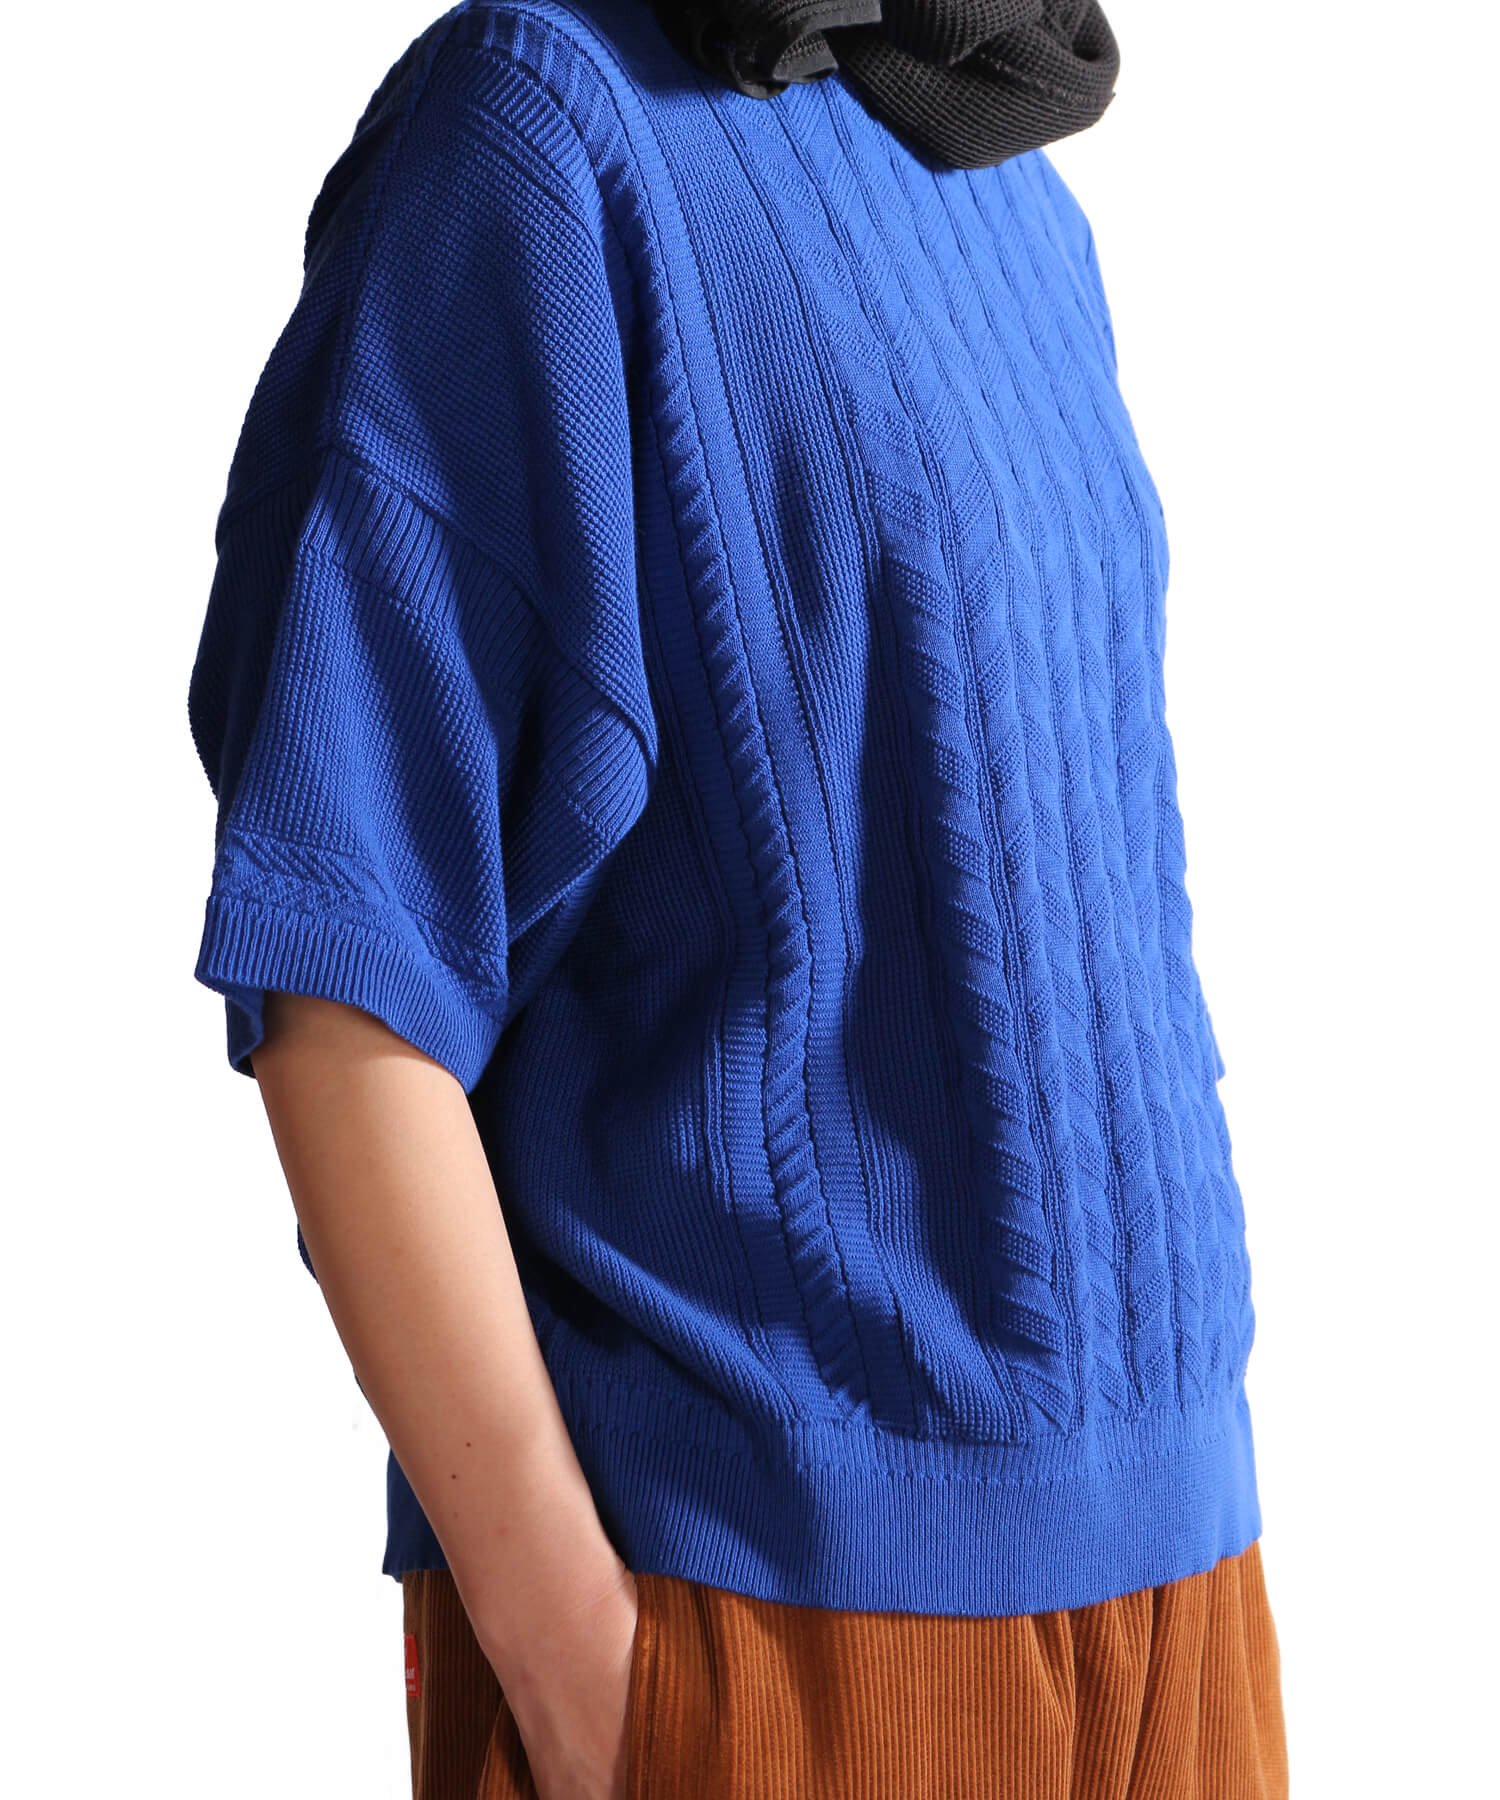 YASHIKI / ヤシキ |YASHIKI / ヤシキ × SIDEMILITIA inc. / サイドミリティア  RYUREI KNIT (LIMITED BLUE/WOMEN'S) 商品画像16